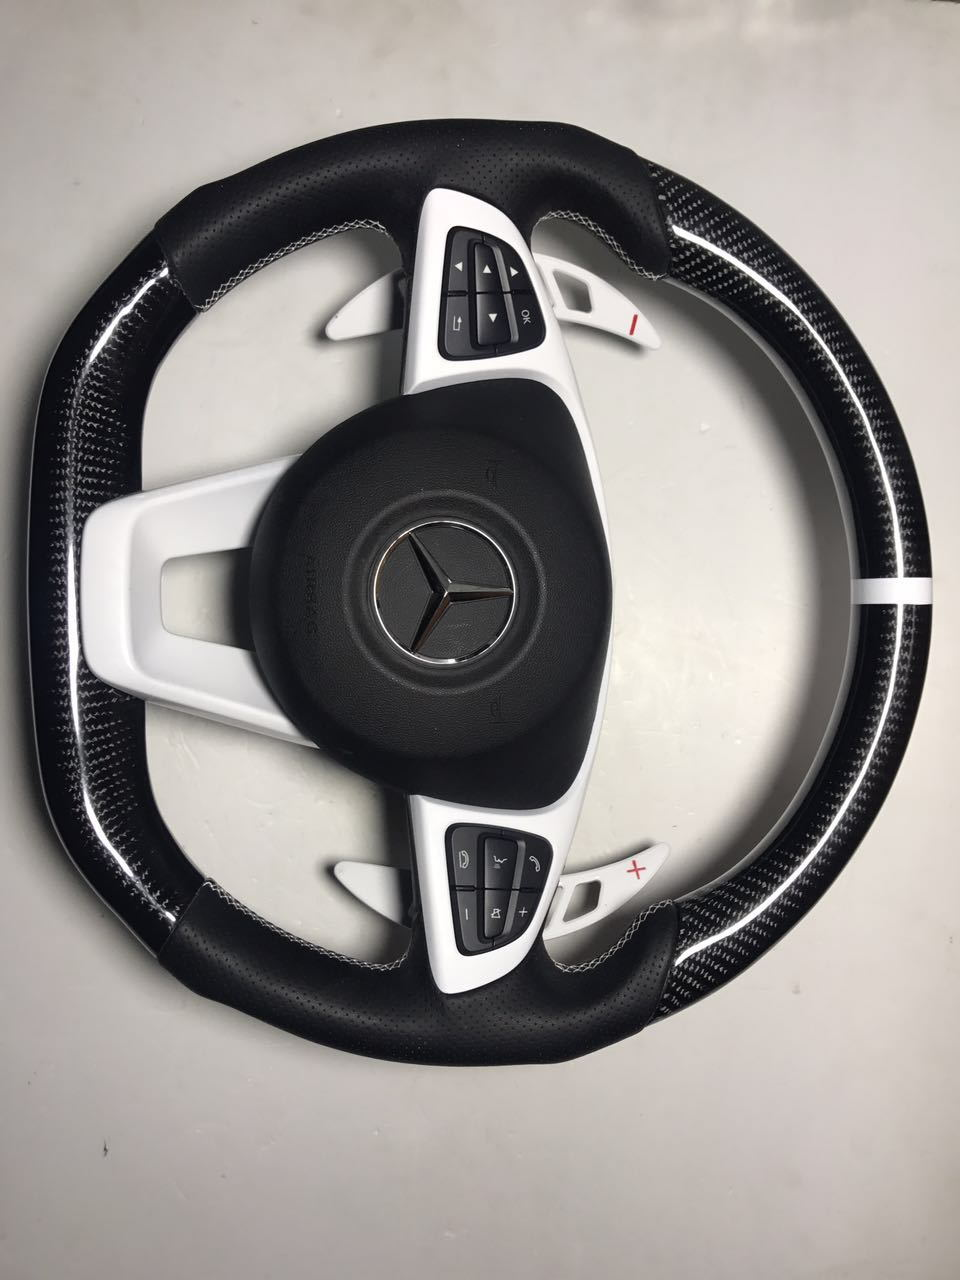 Revotech Presents Carbon Fiber Interior Steering Wheel Upgrade Forums